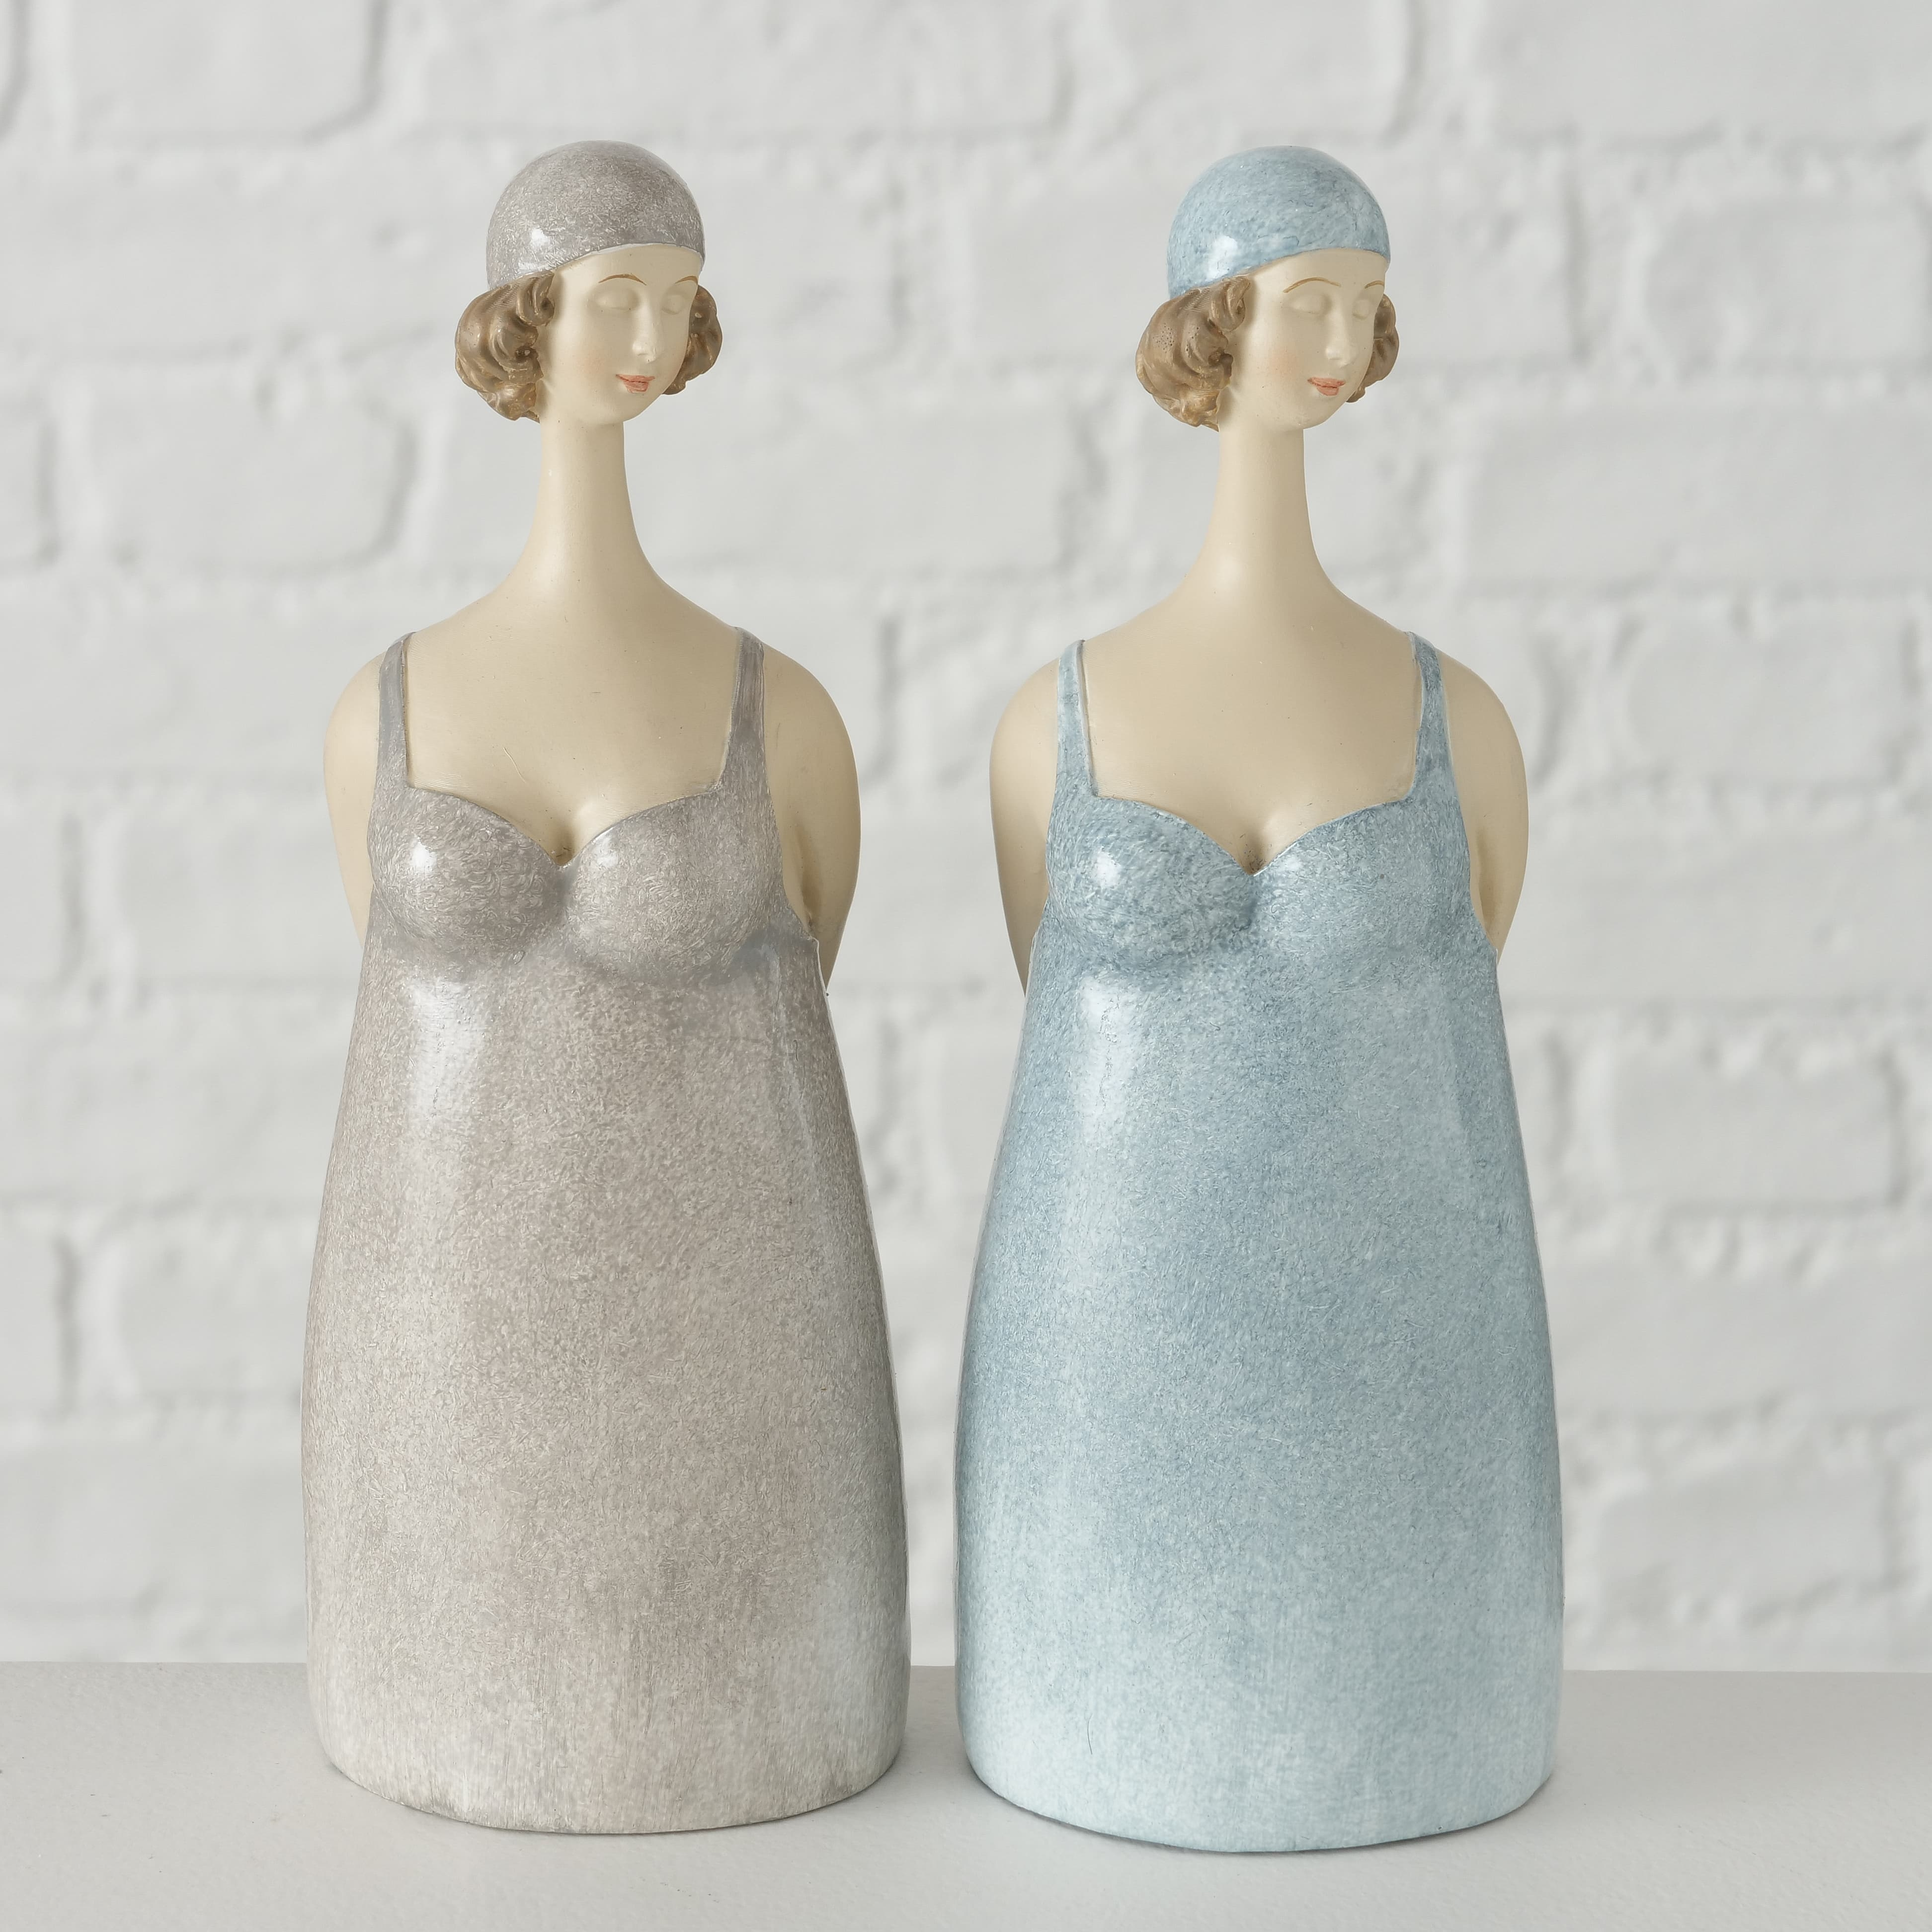 Figurina decorativa din polirasina Celeste Bleu / Gri, Modele Asortate, l8xA7xH20 cm poza